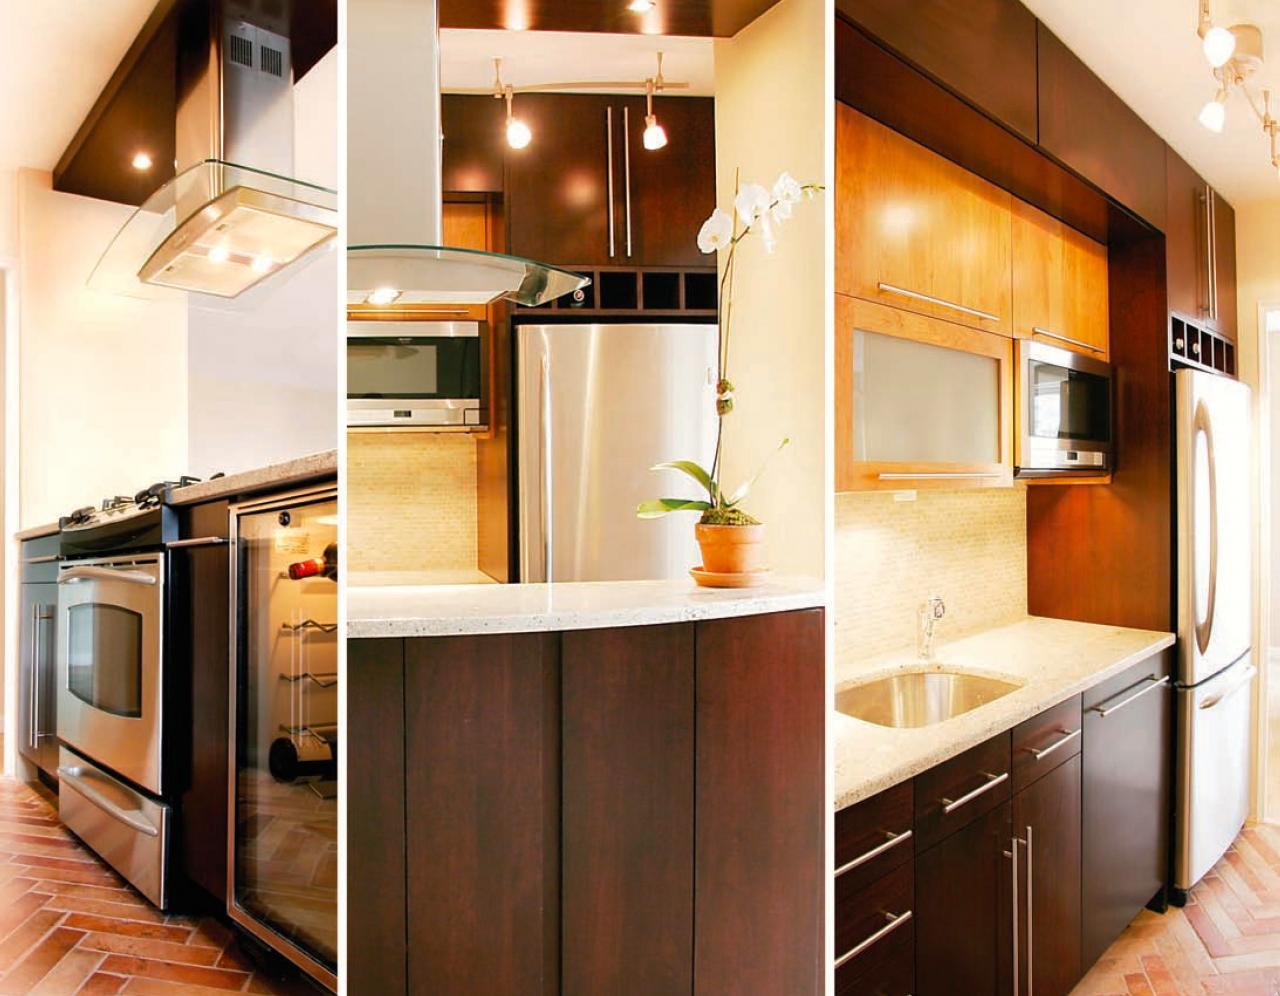 CFM Kitchen And Bath Inc.